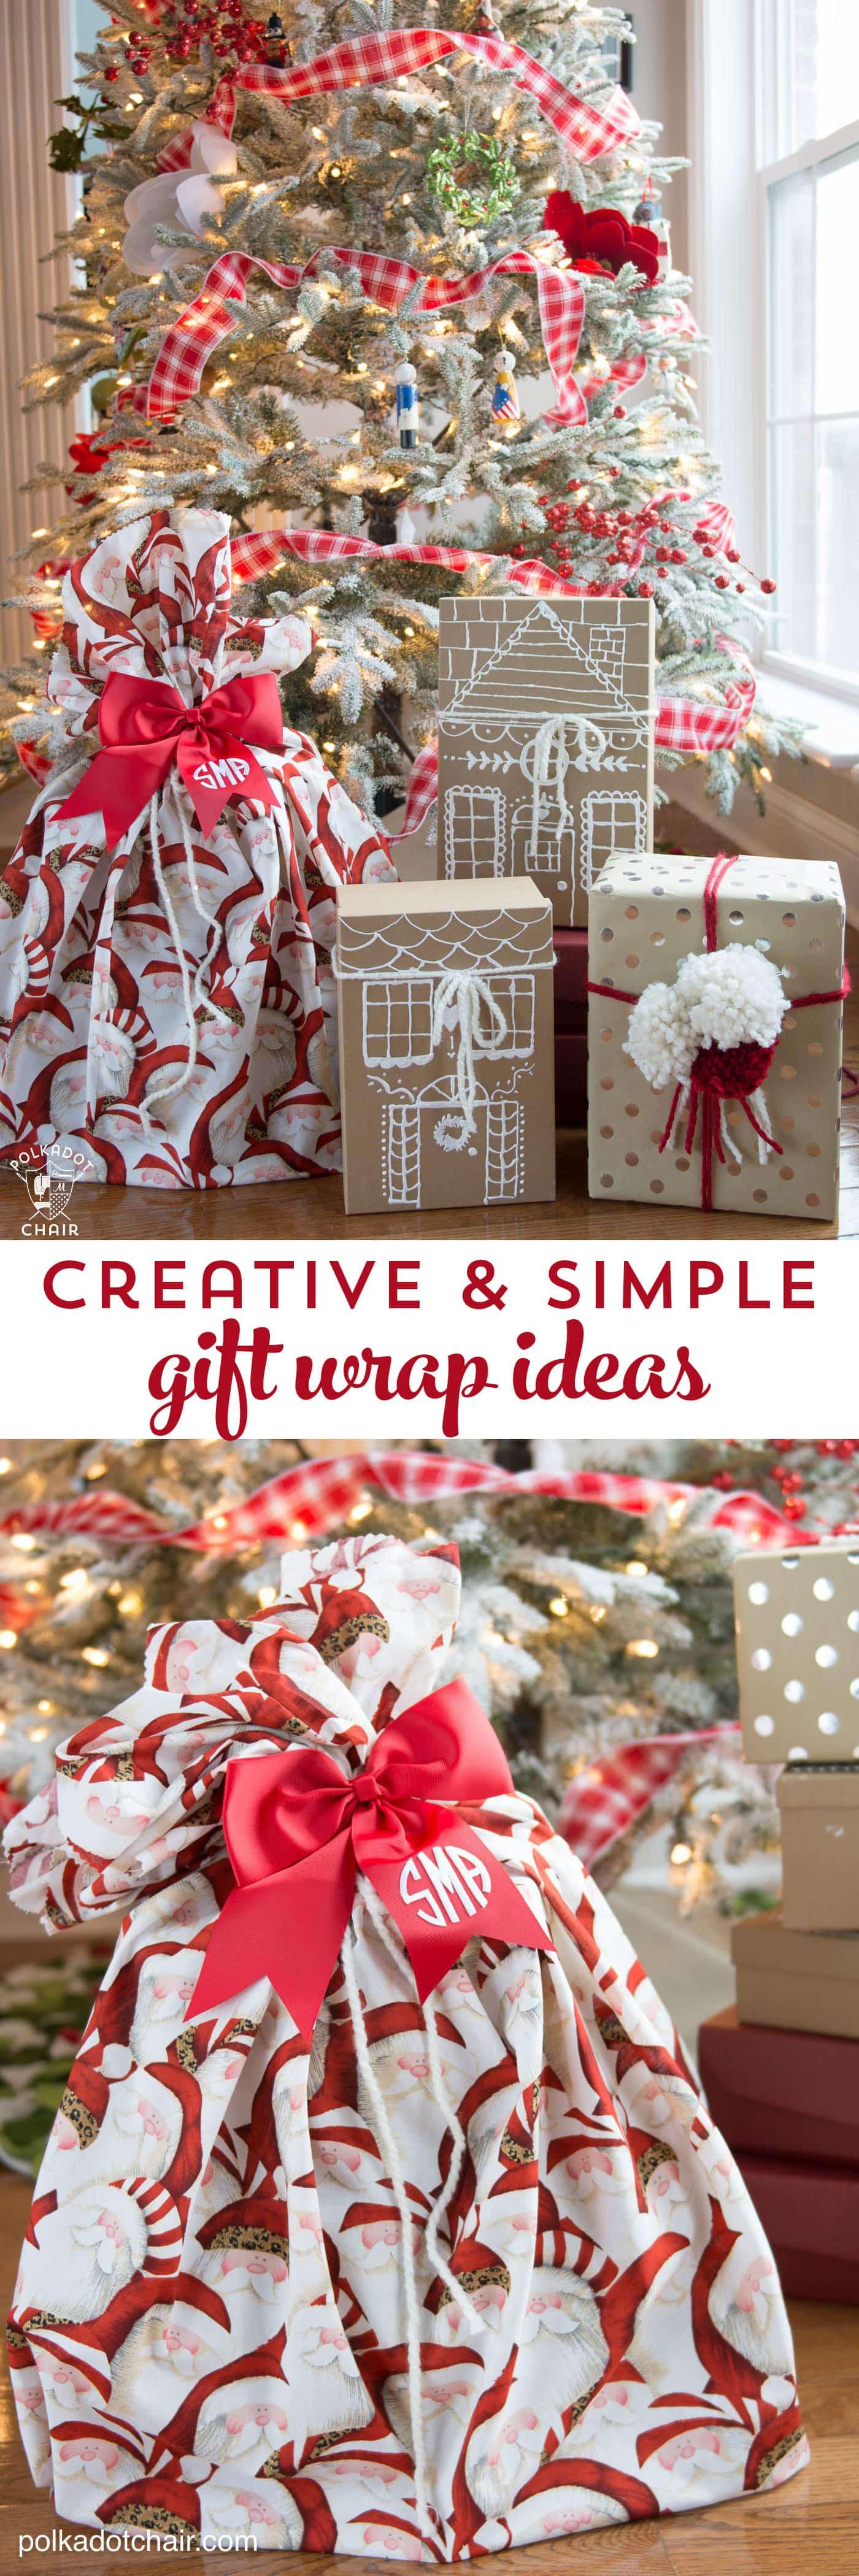 Creative Christmas Gift Ideas  3 Simple and Creative Gift Wrap Ideas The Polka Dot Chair